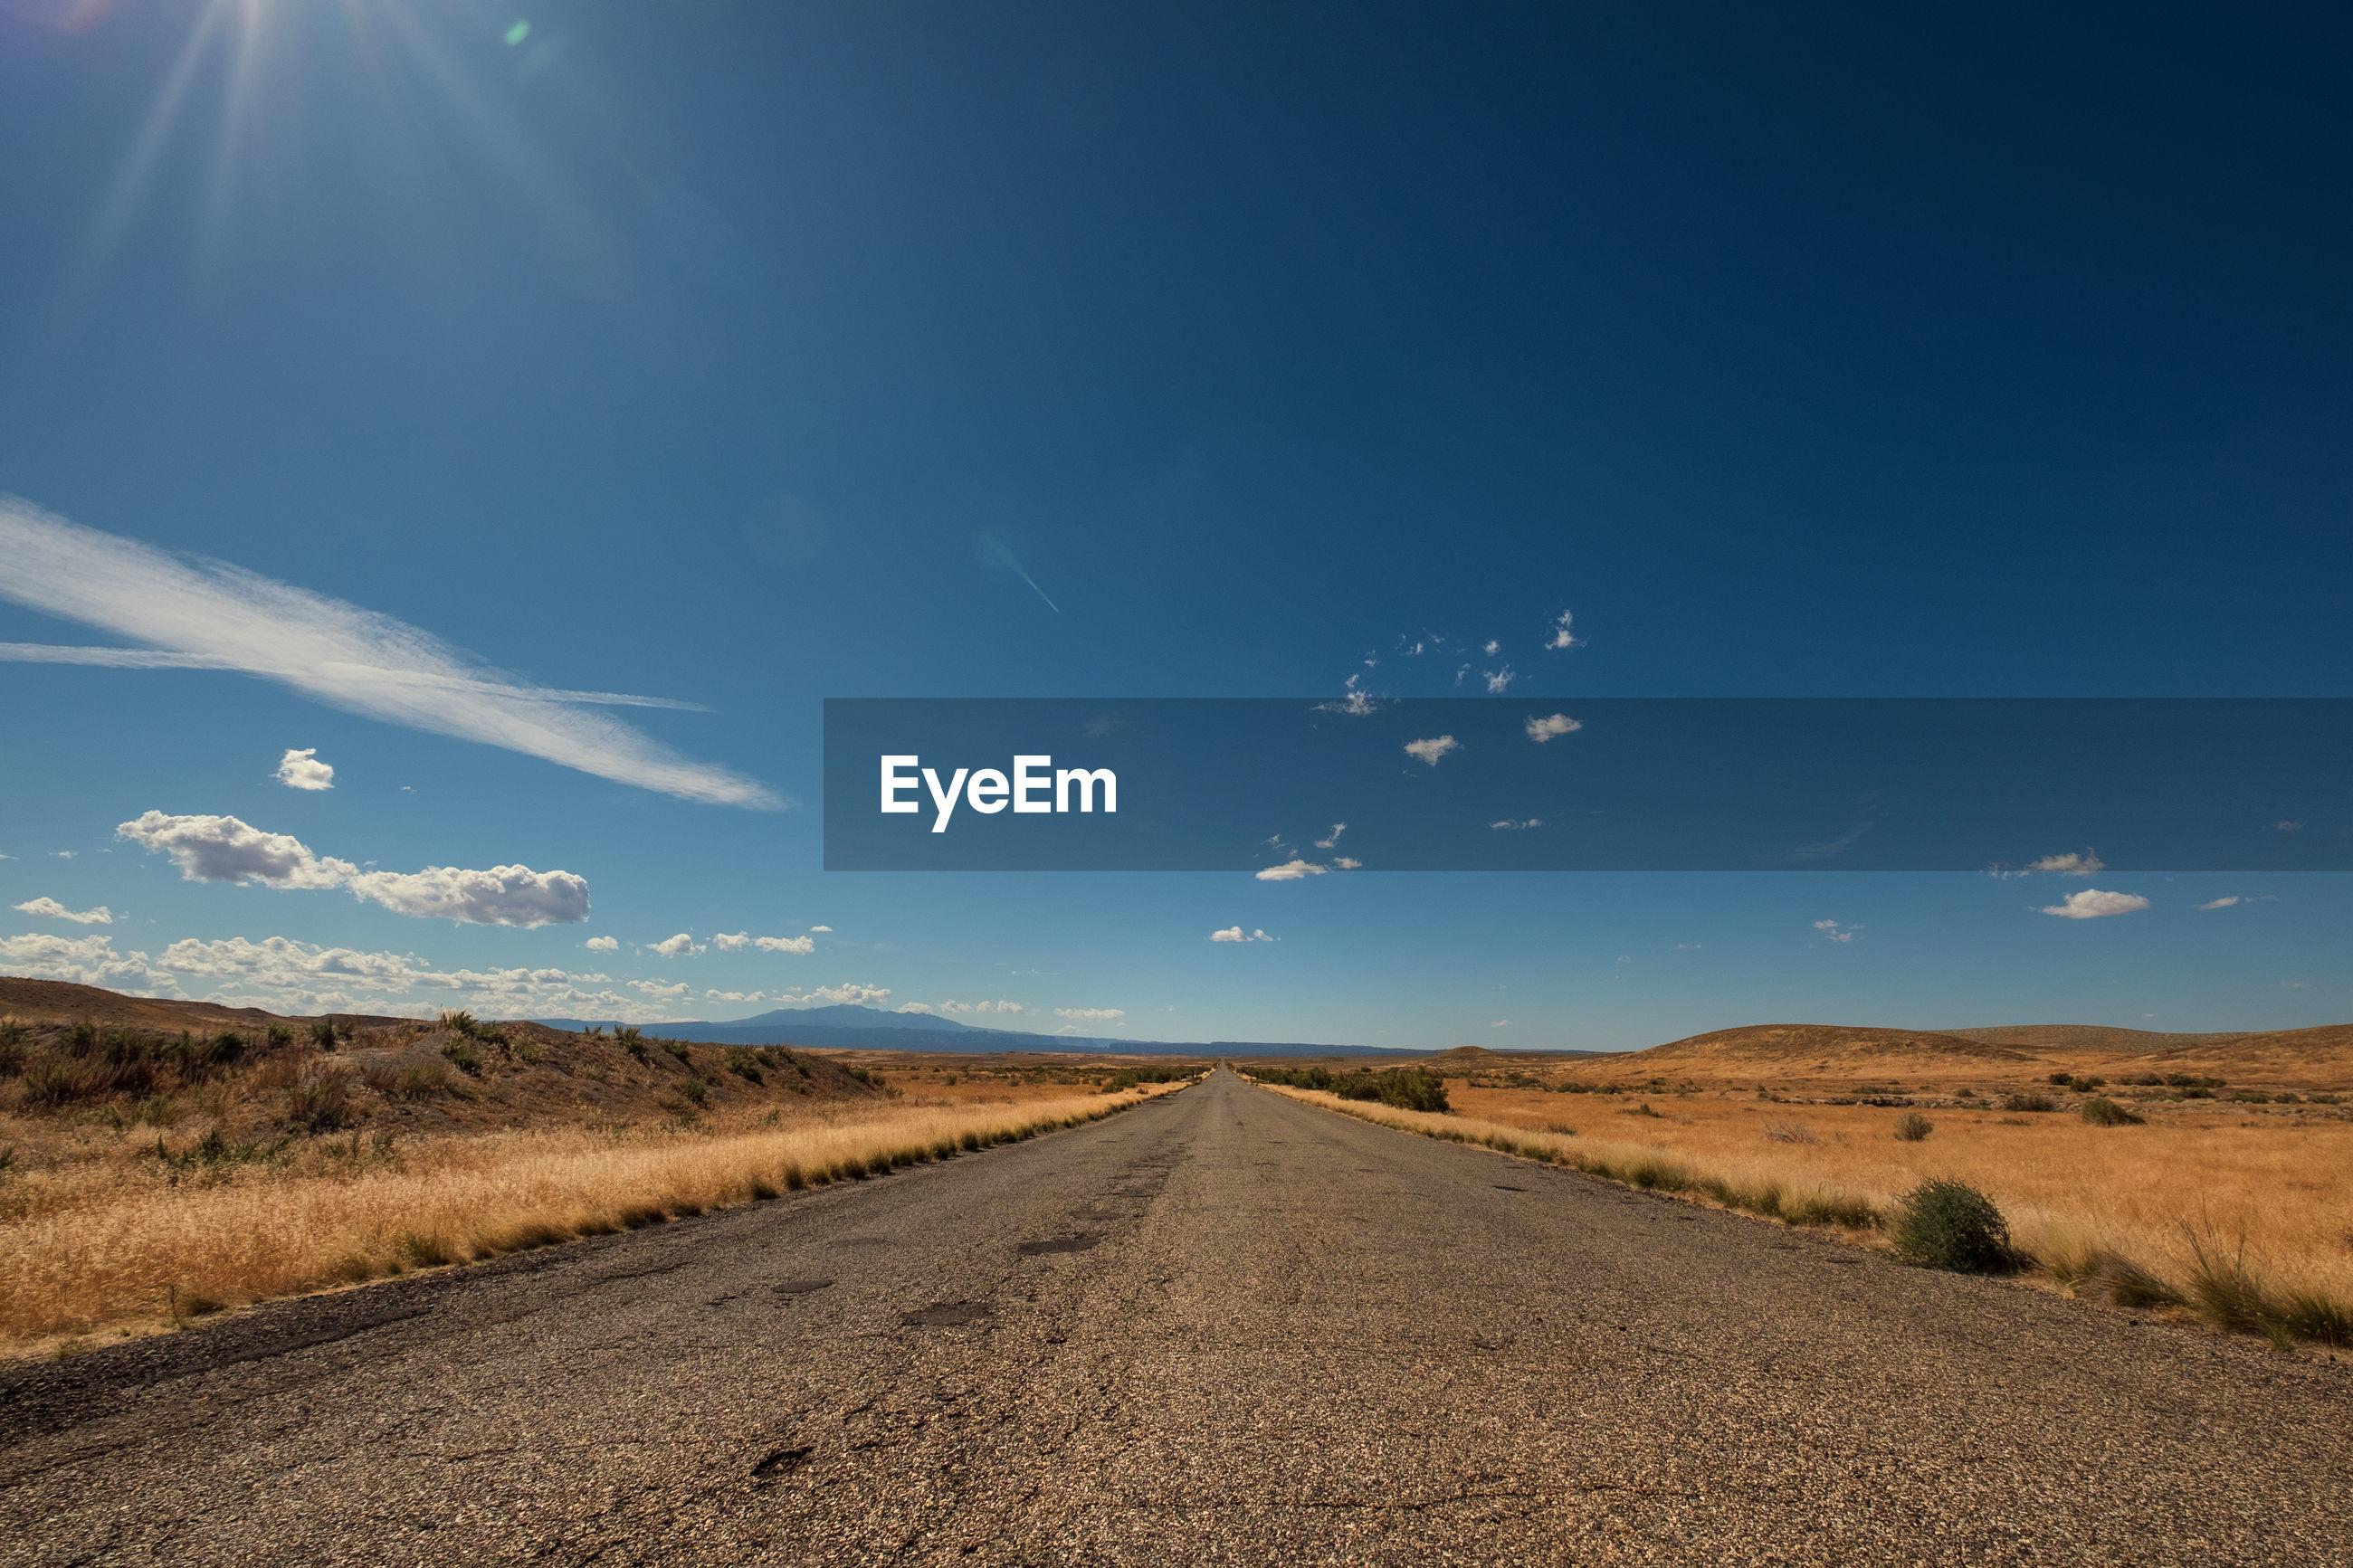 Deserted road in arid landscape